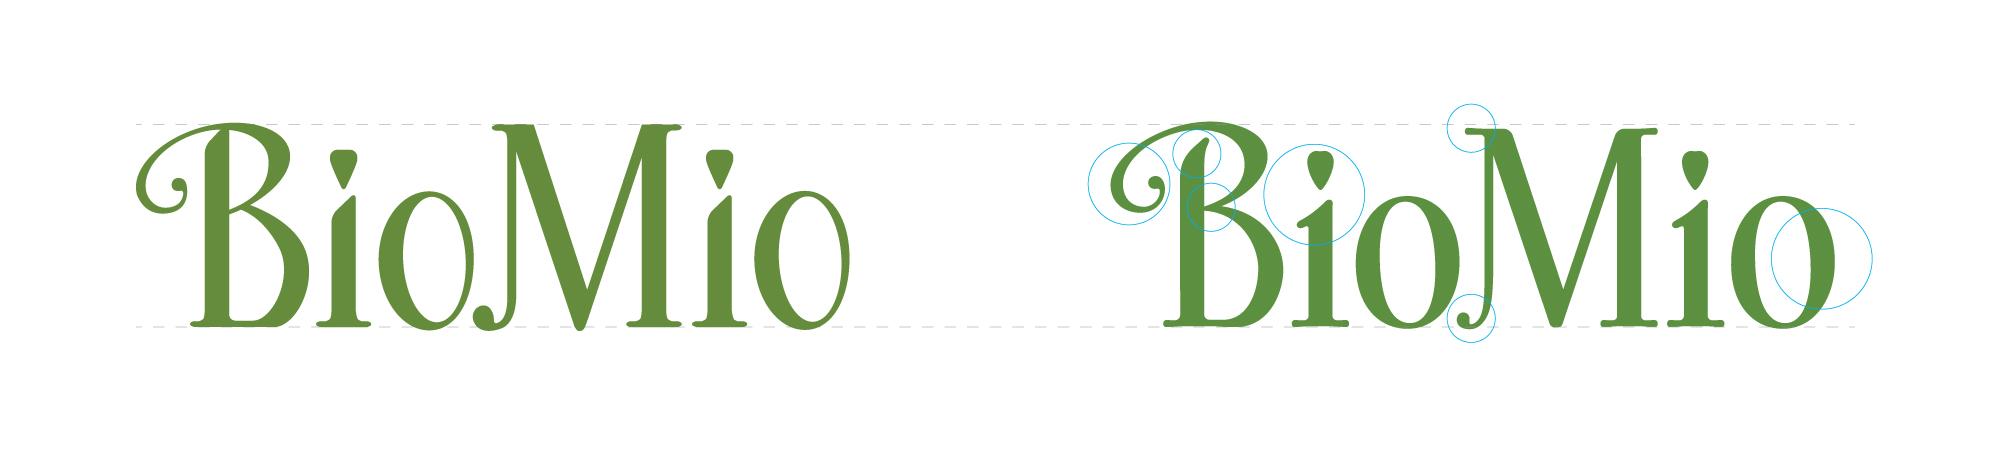 Justbenice-BioMio-logo2.jpg